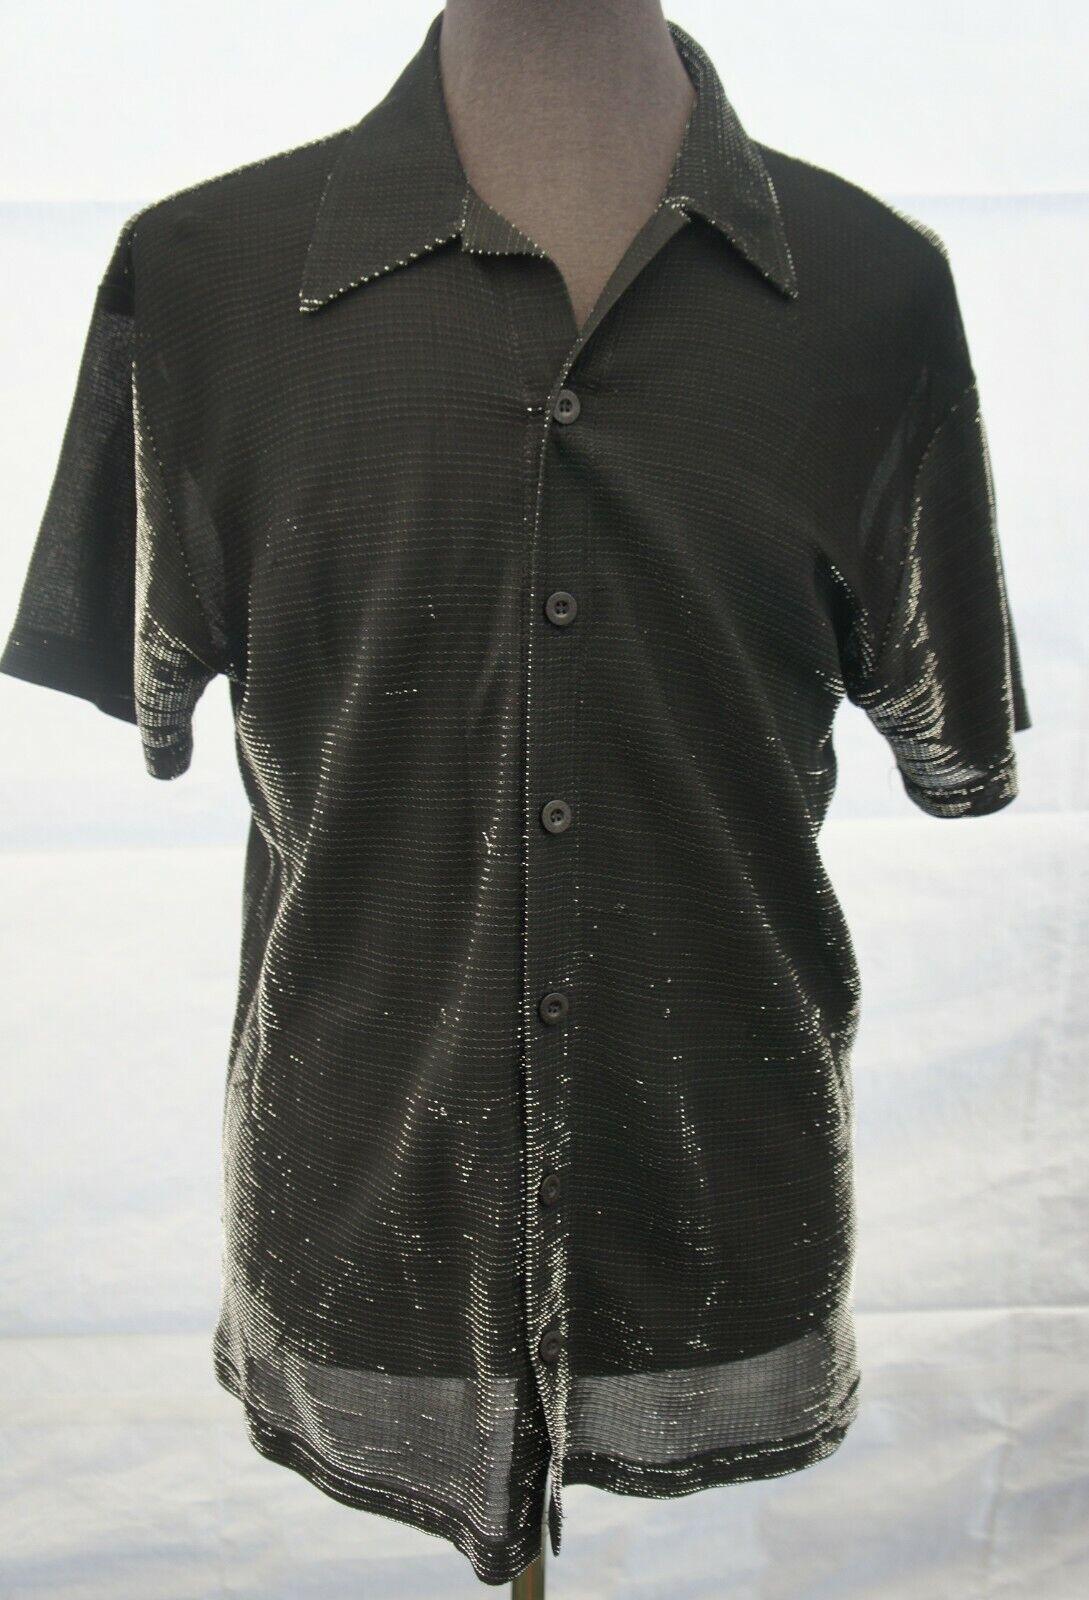 Vintage 40s Yellow Lace Up Longsleeve Rayon Gaucho Shirt Delmonico S Rockabilly